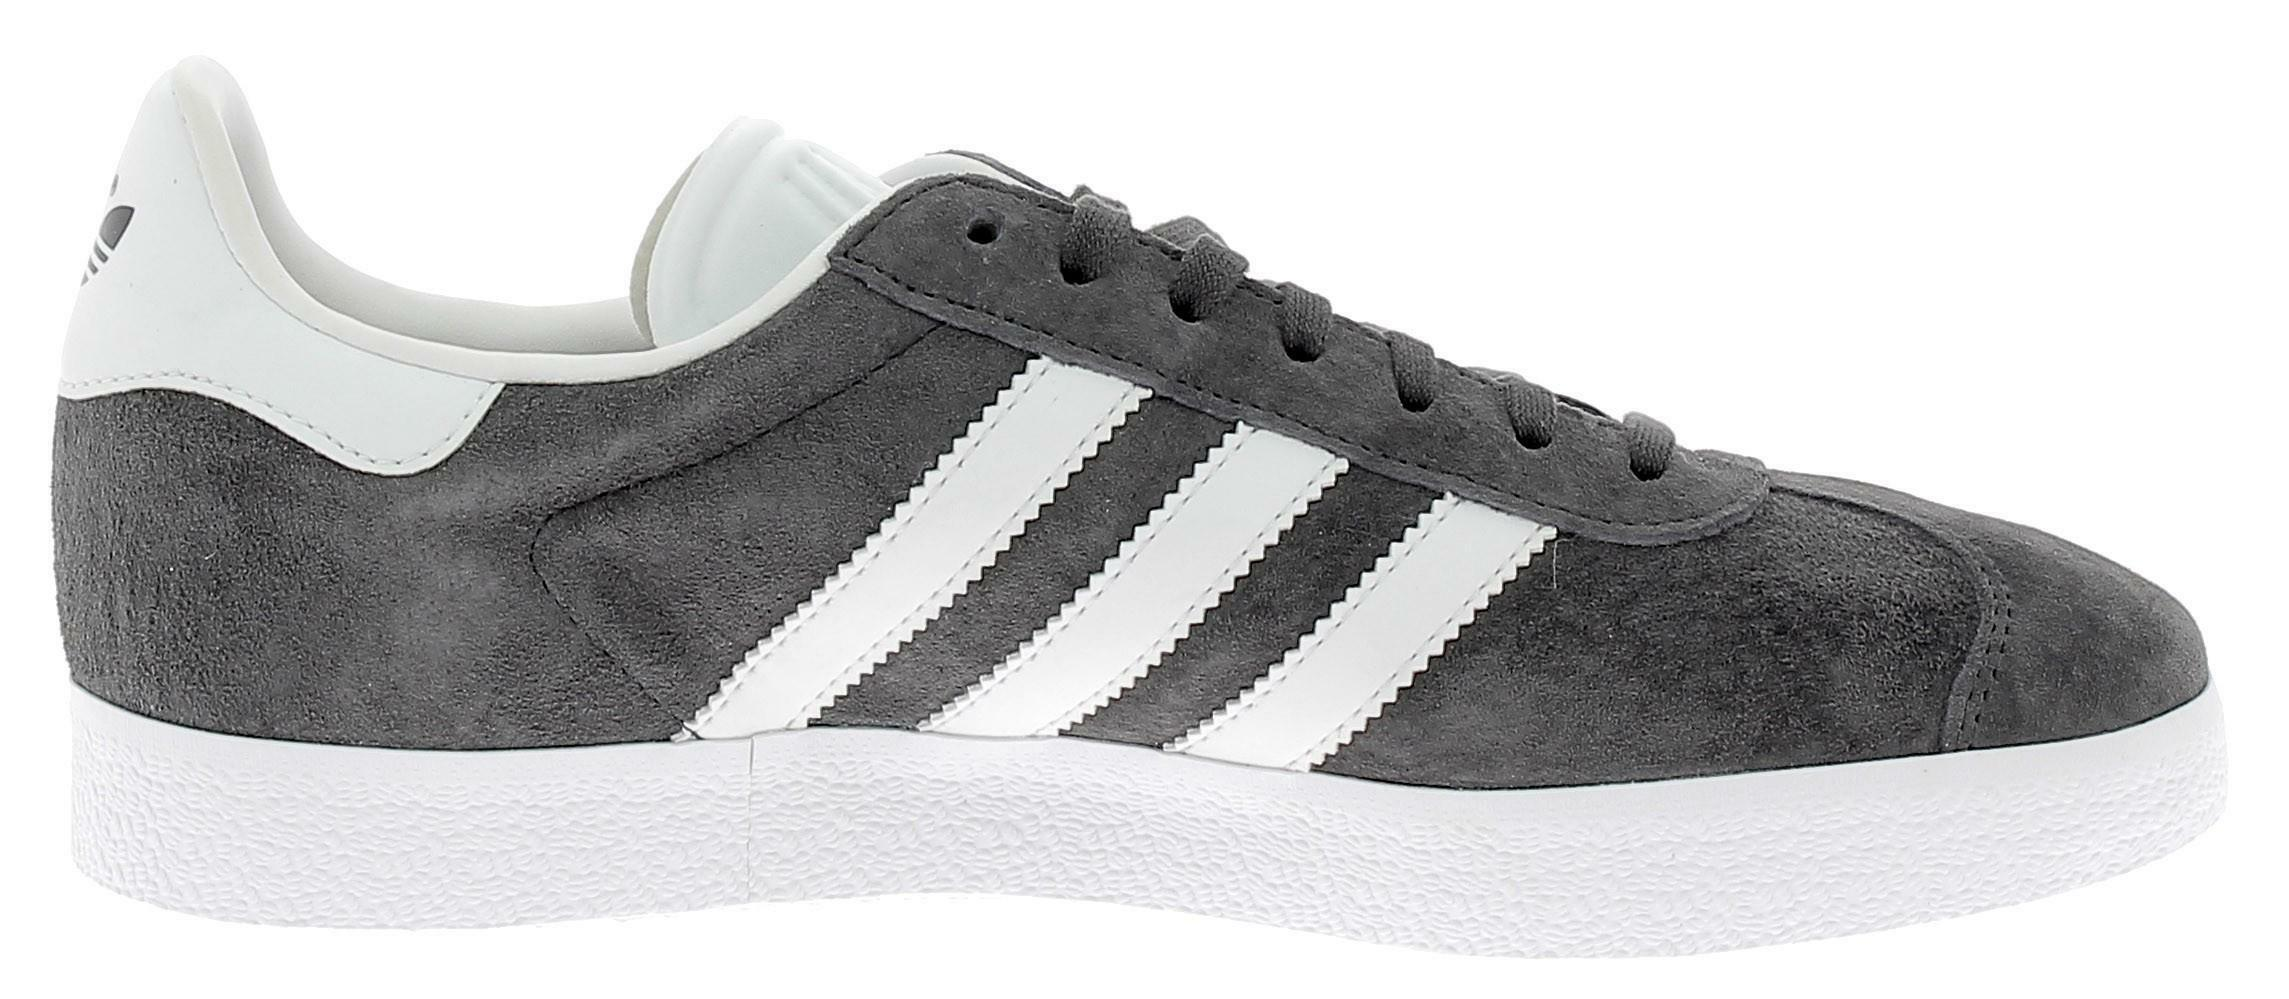 adidas gazelle scarpe sportive uomo grigie